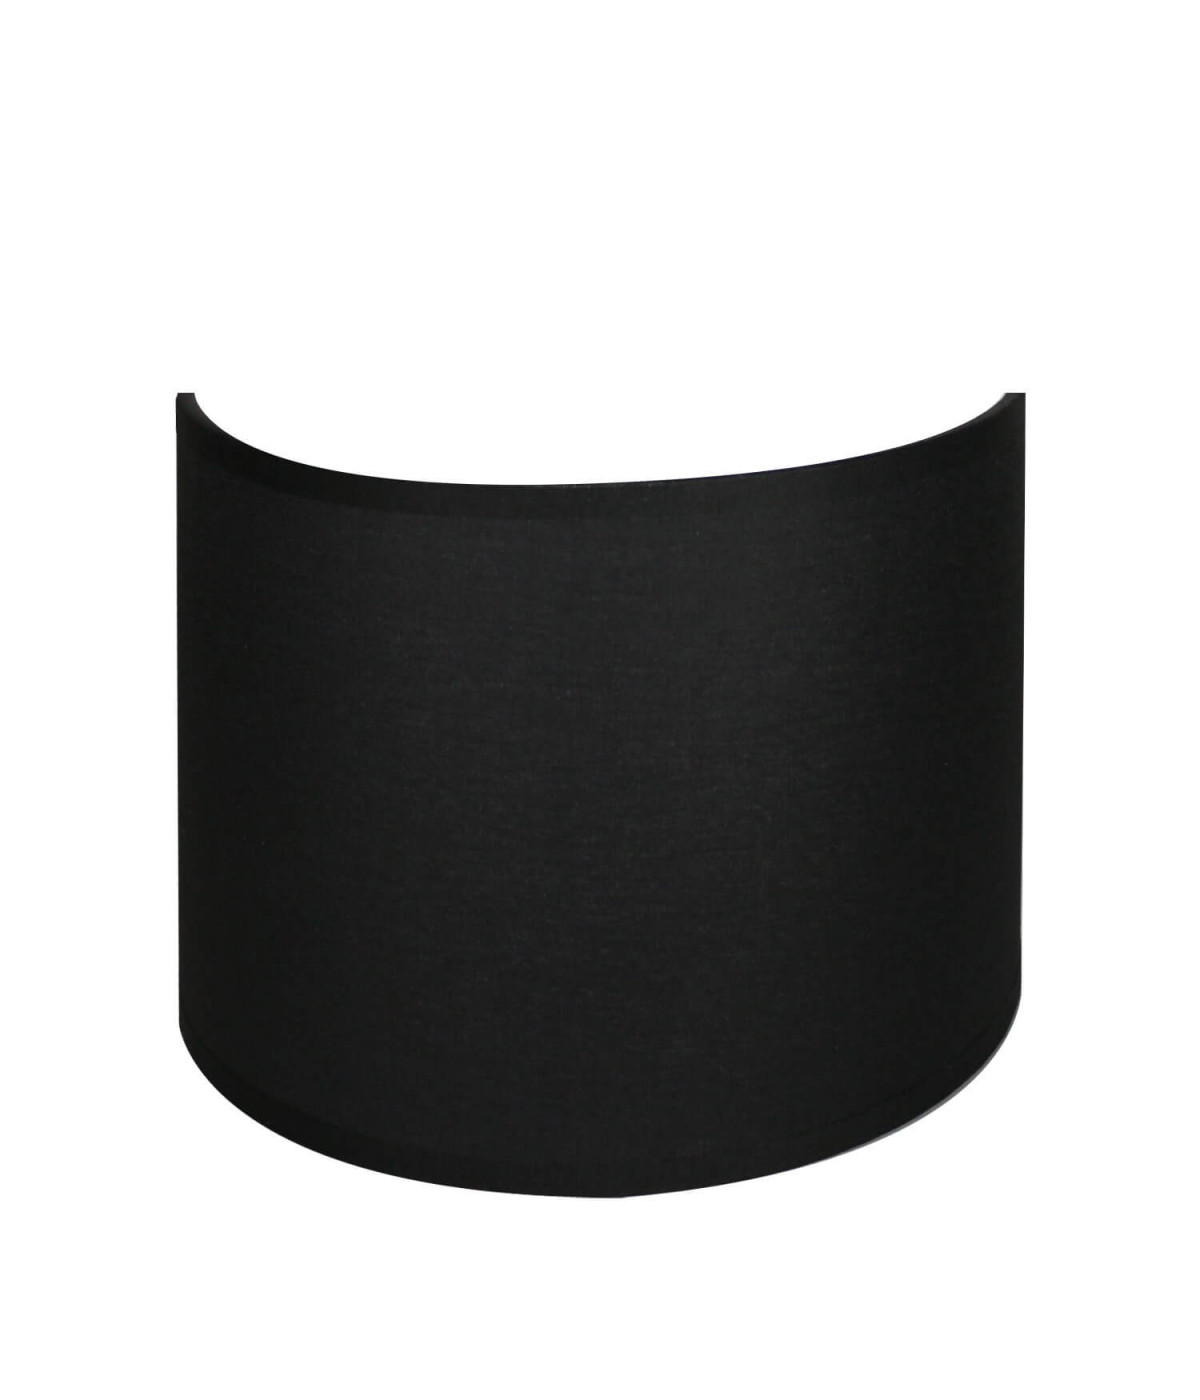 applique ronde noir